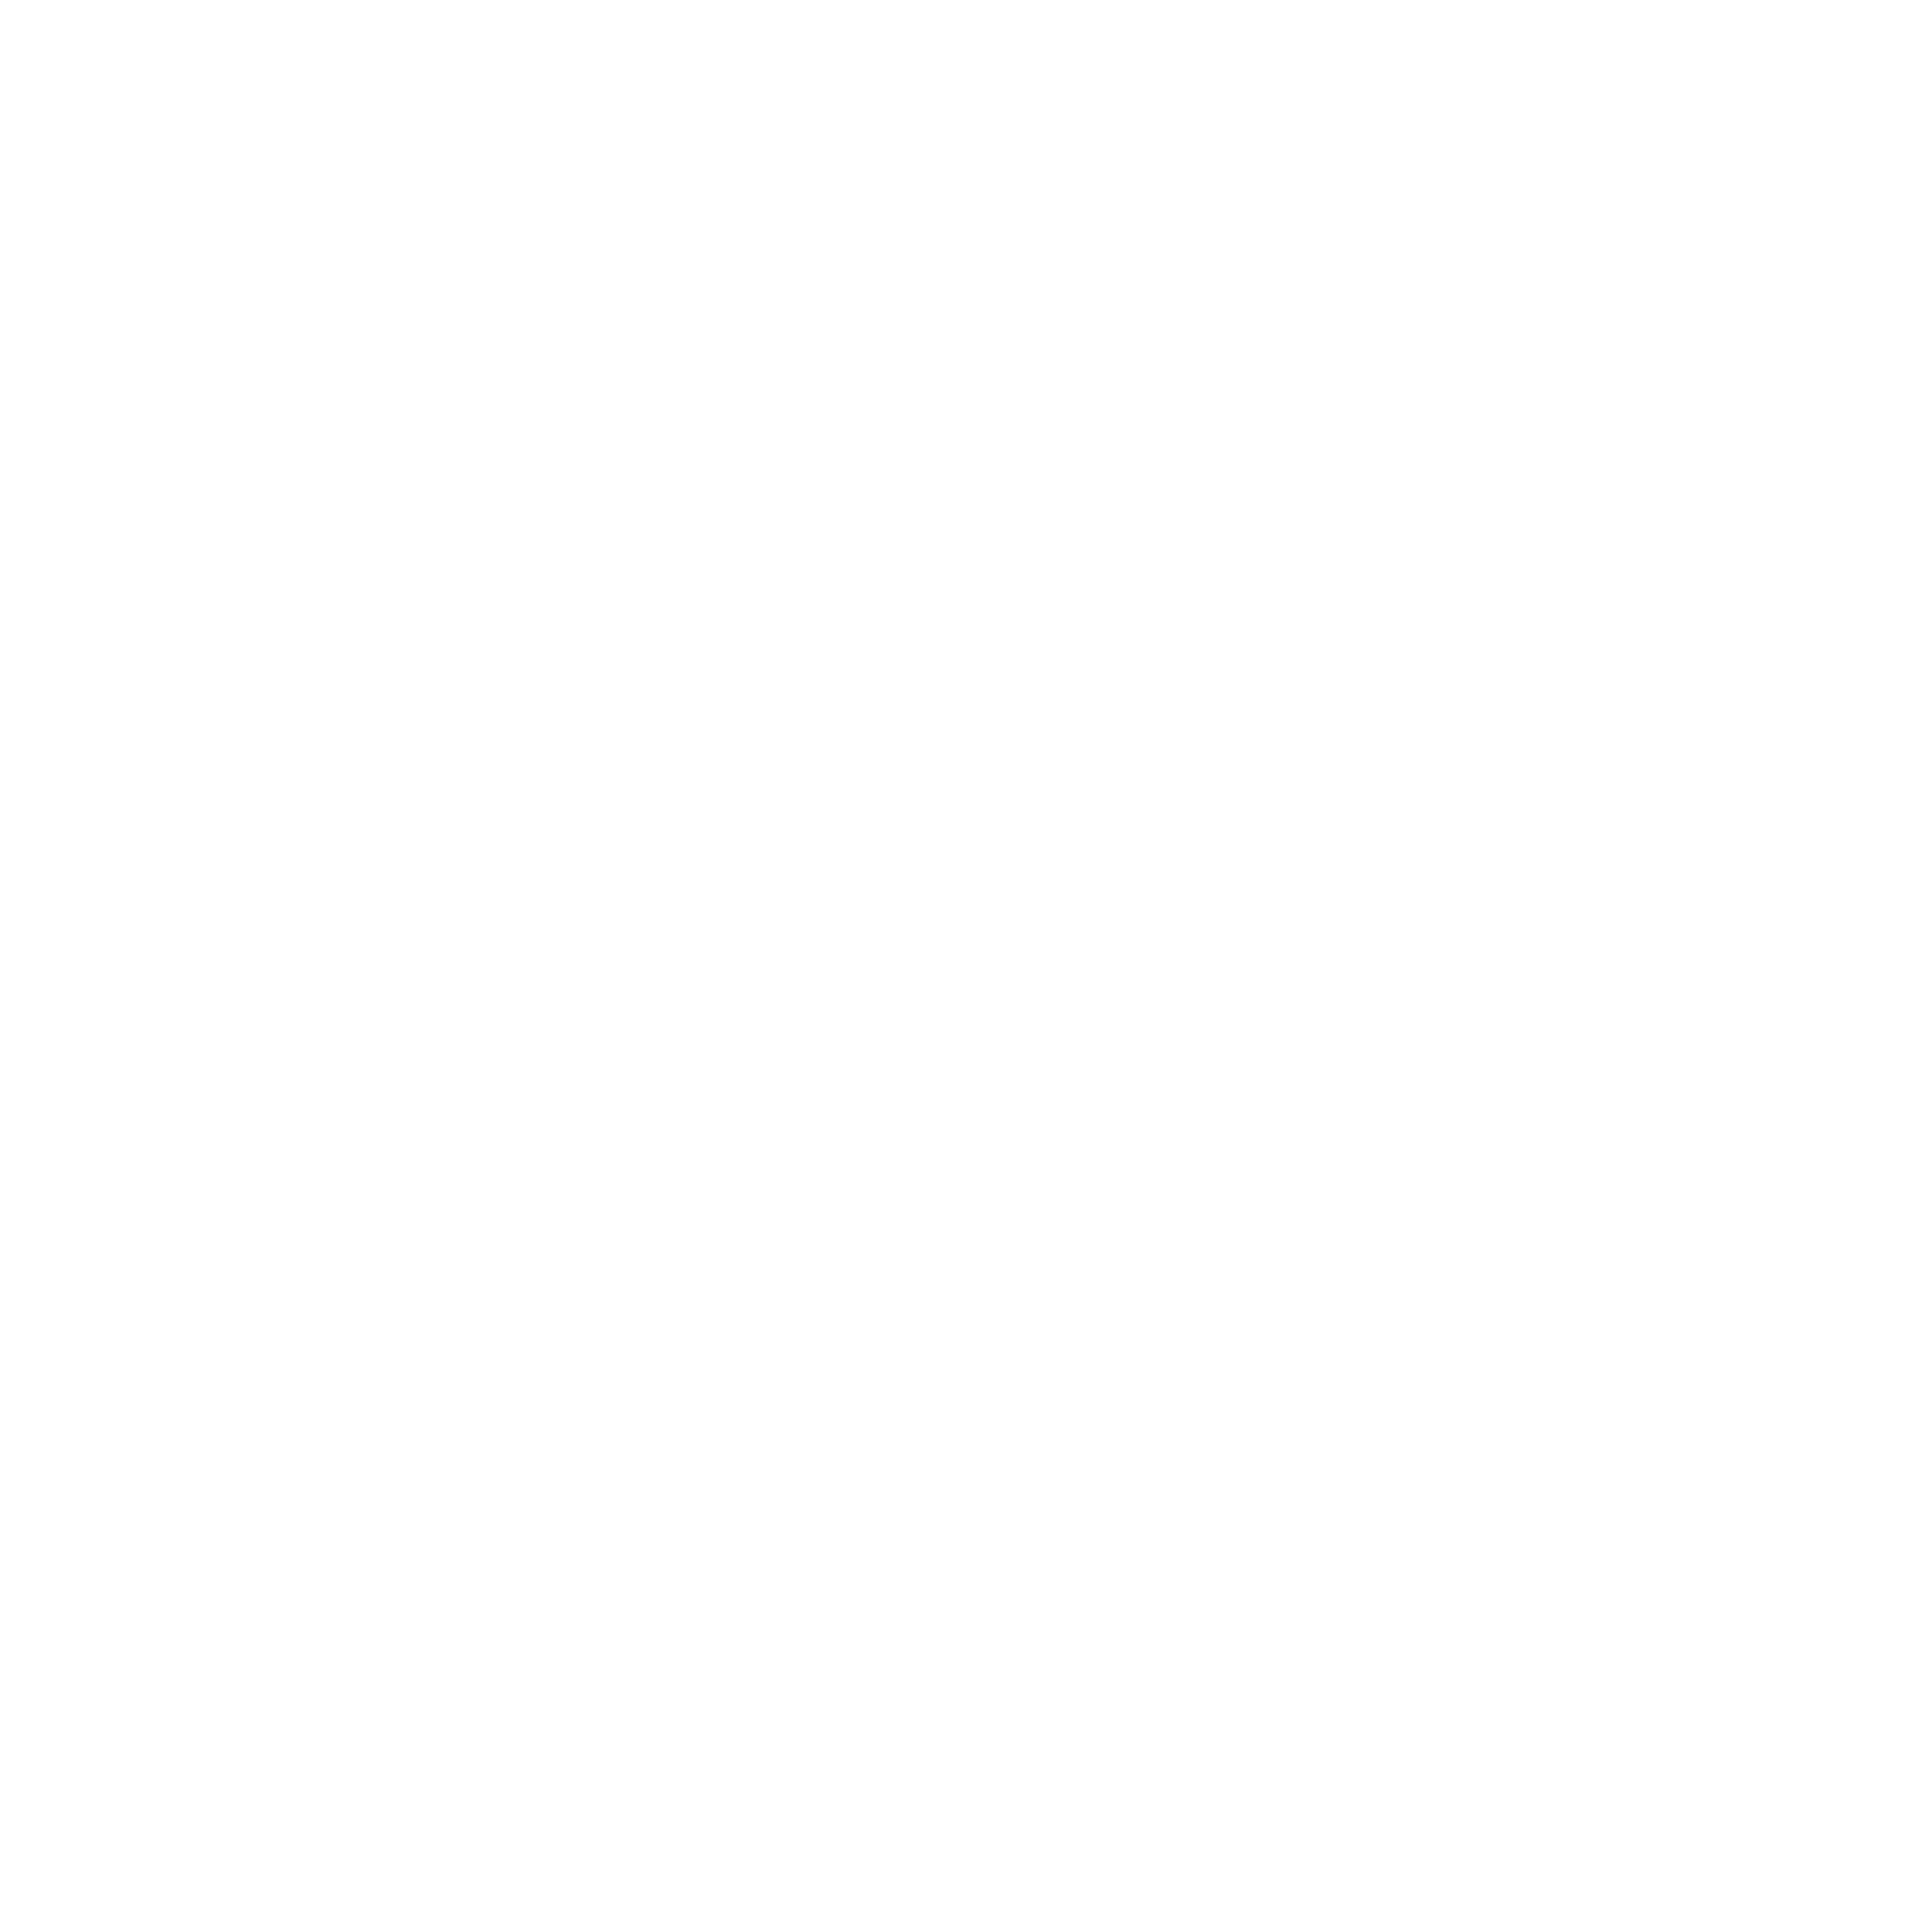 2000px-Toicon-icon-stone-collectWH